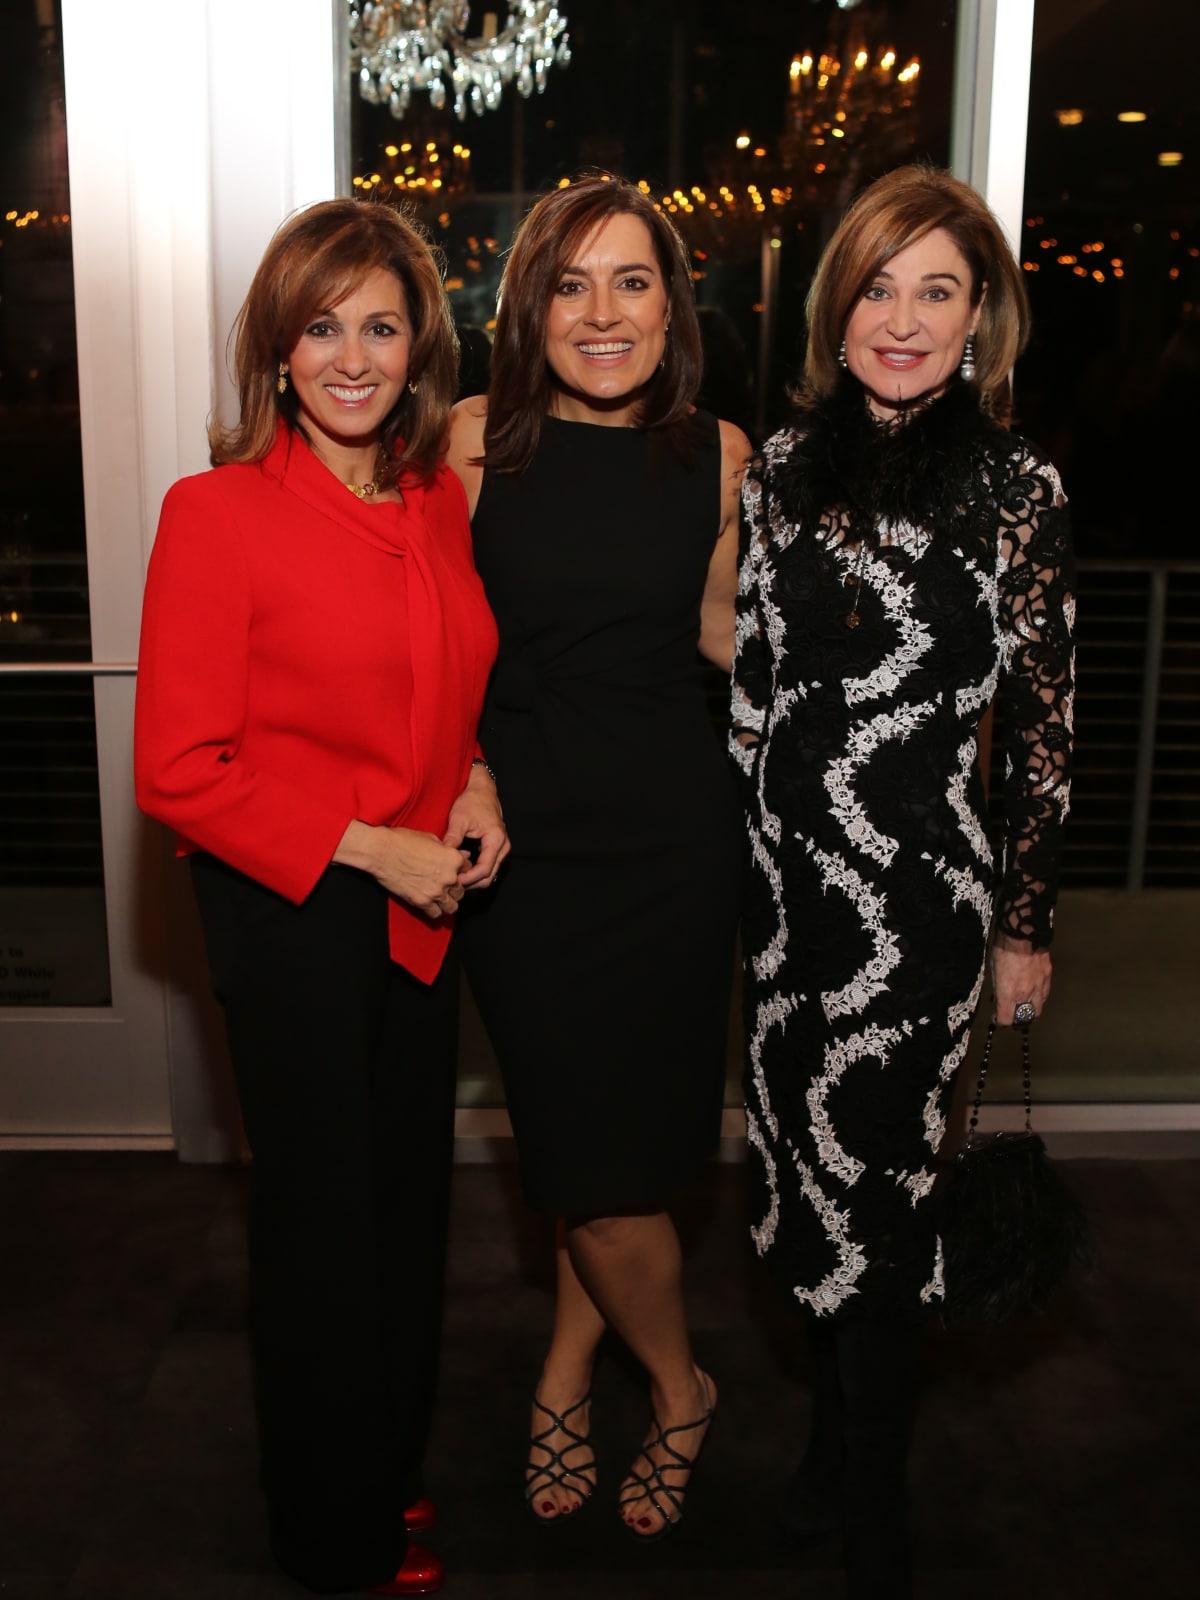 News, Equinox Opening Dinner, Dec. 2015, Janet Shamlian, Sarah Robb O'Hagan, Becca Cason Thrash